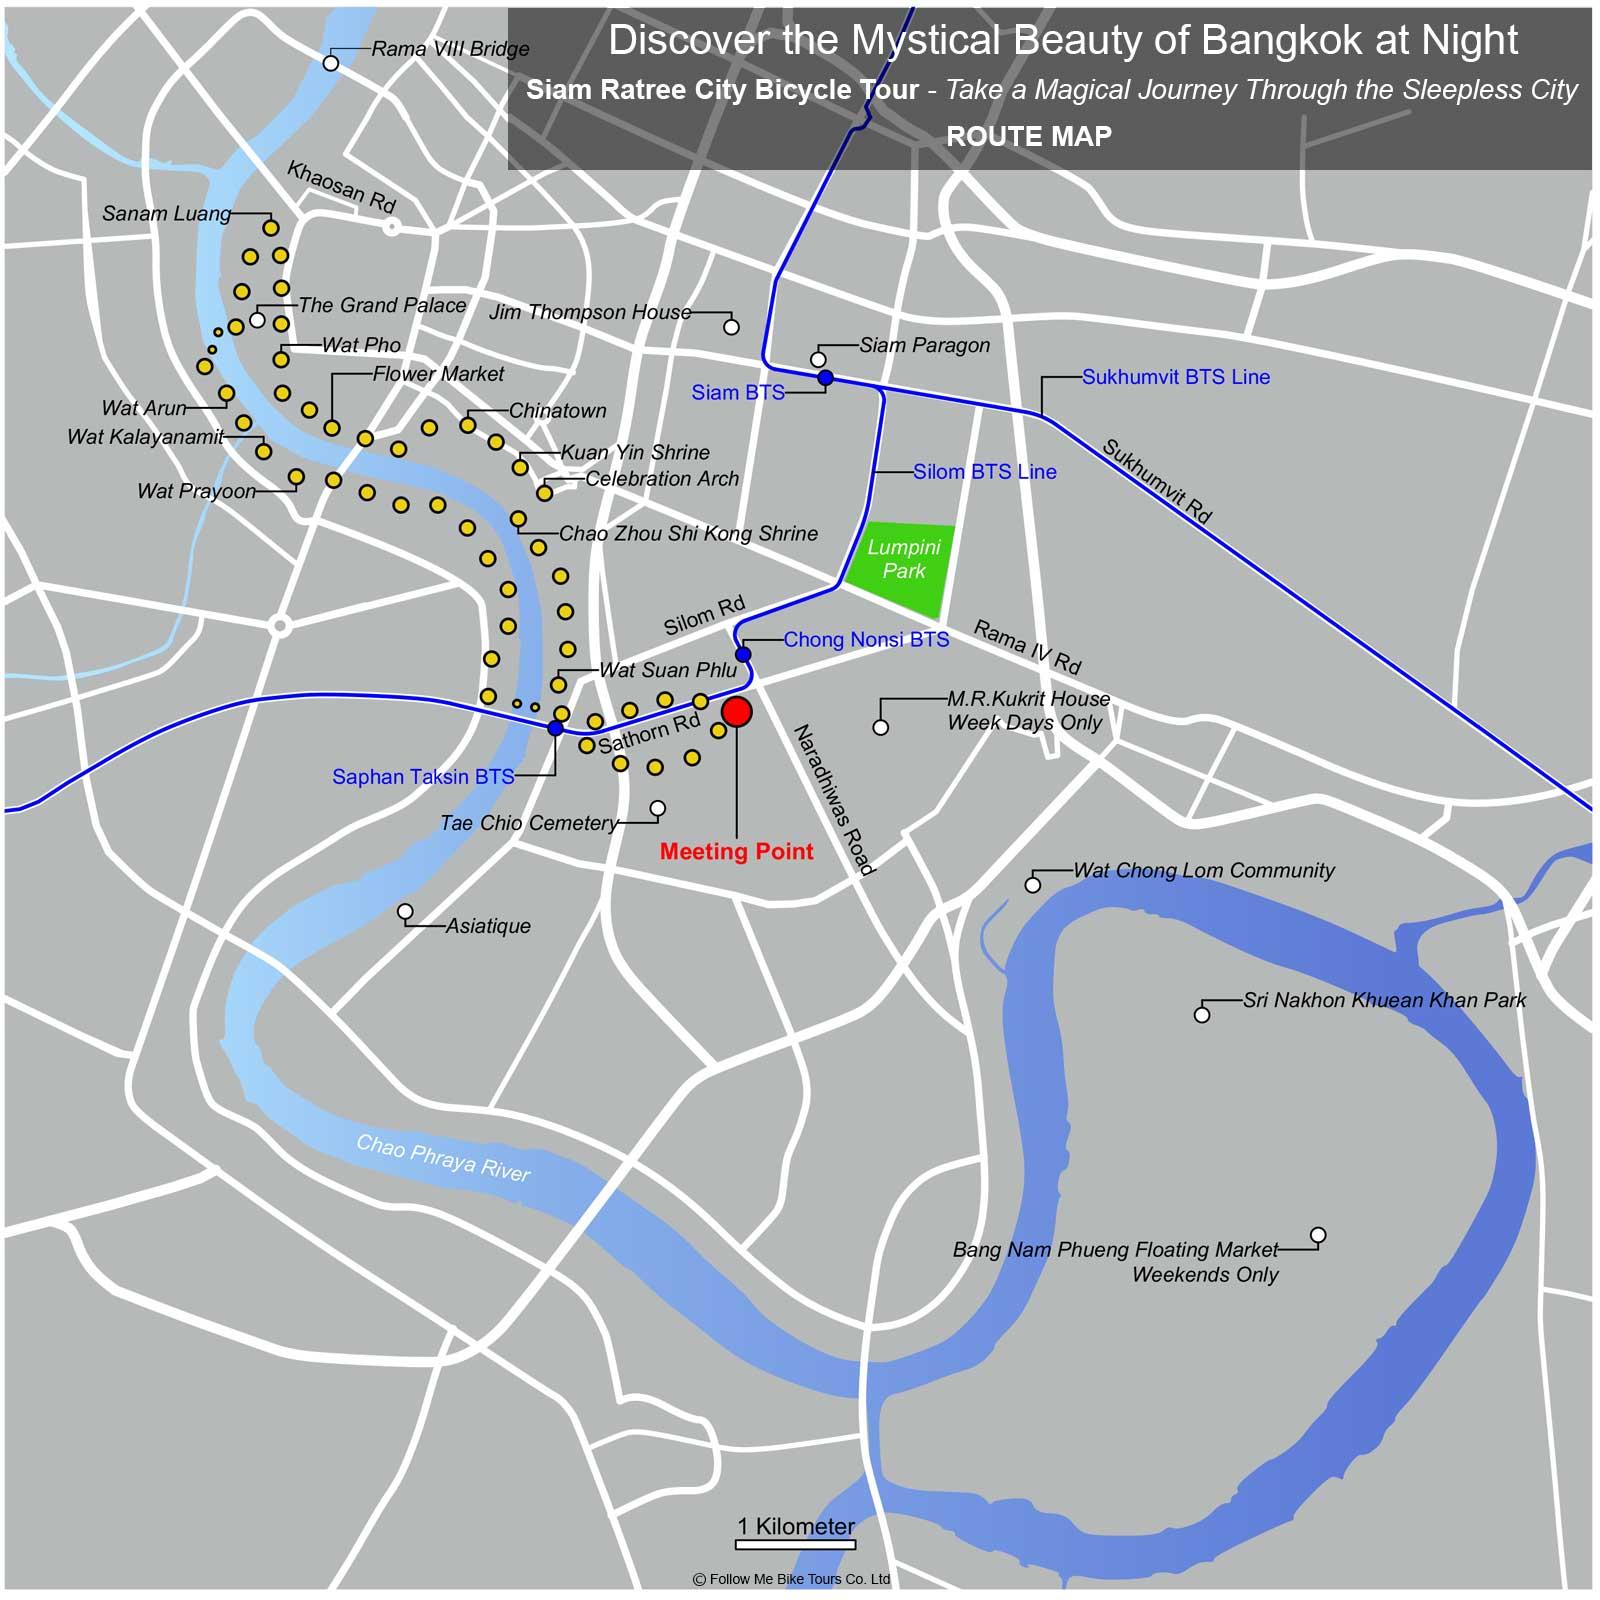 siam-ratree-bangkok-night-city-bike-tour-follow-me